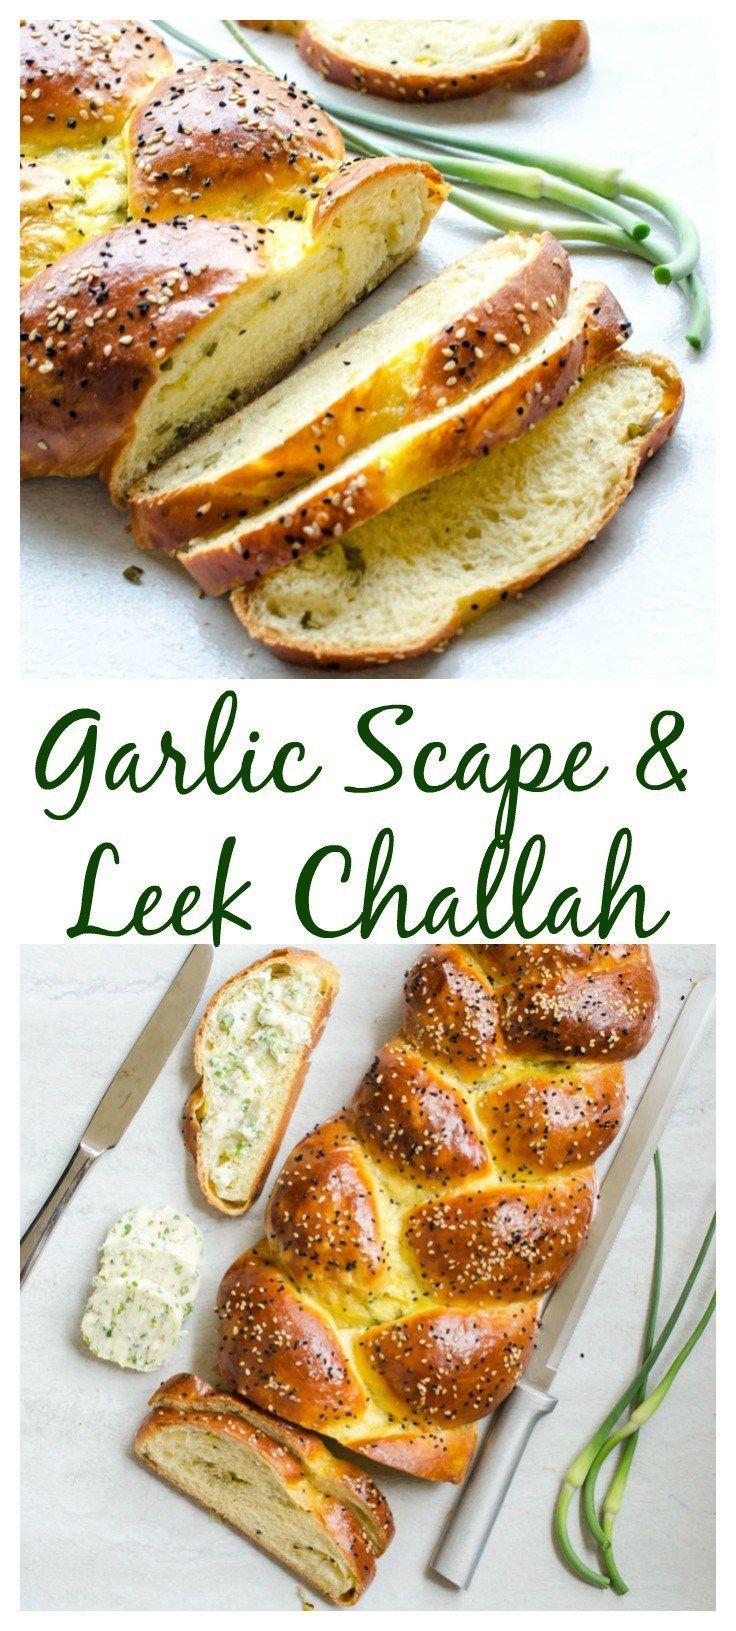 Garlic Scape and Leek Challah